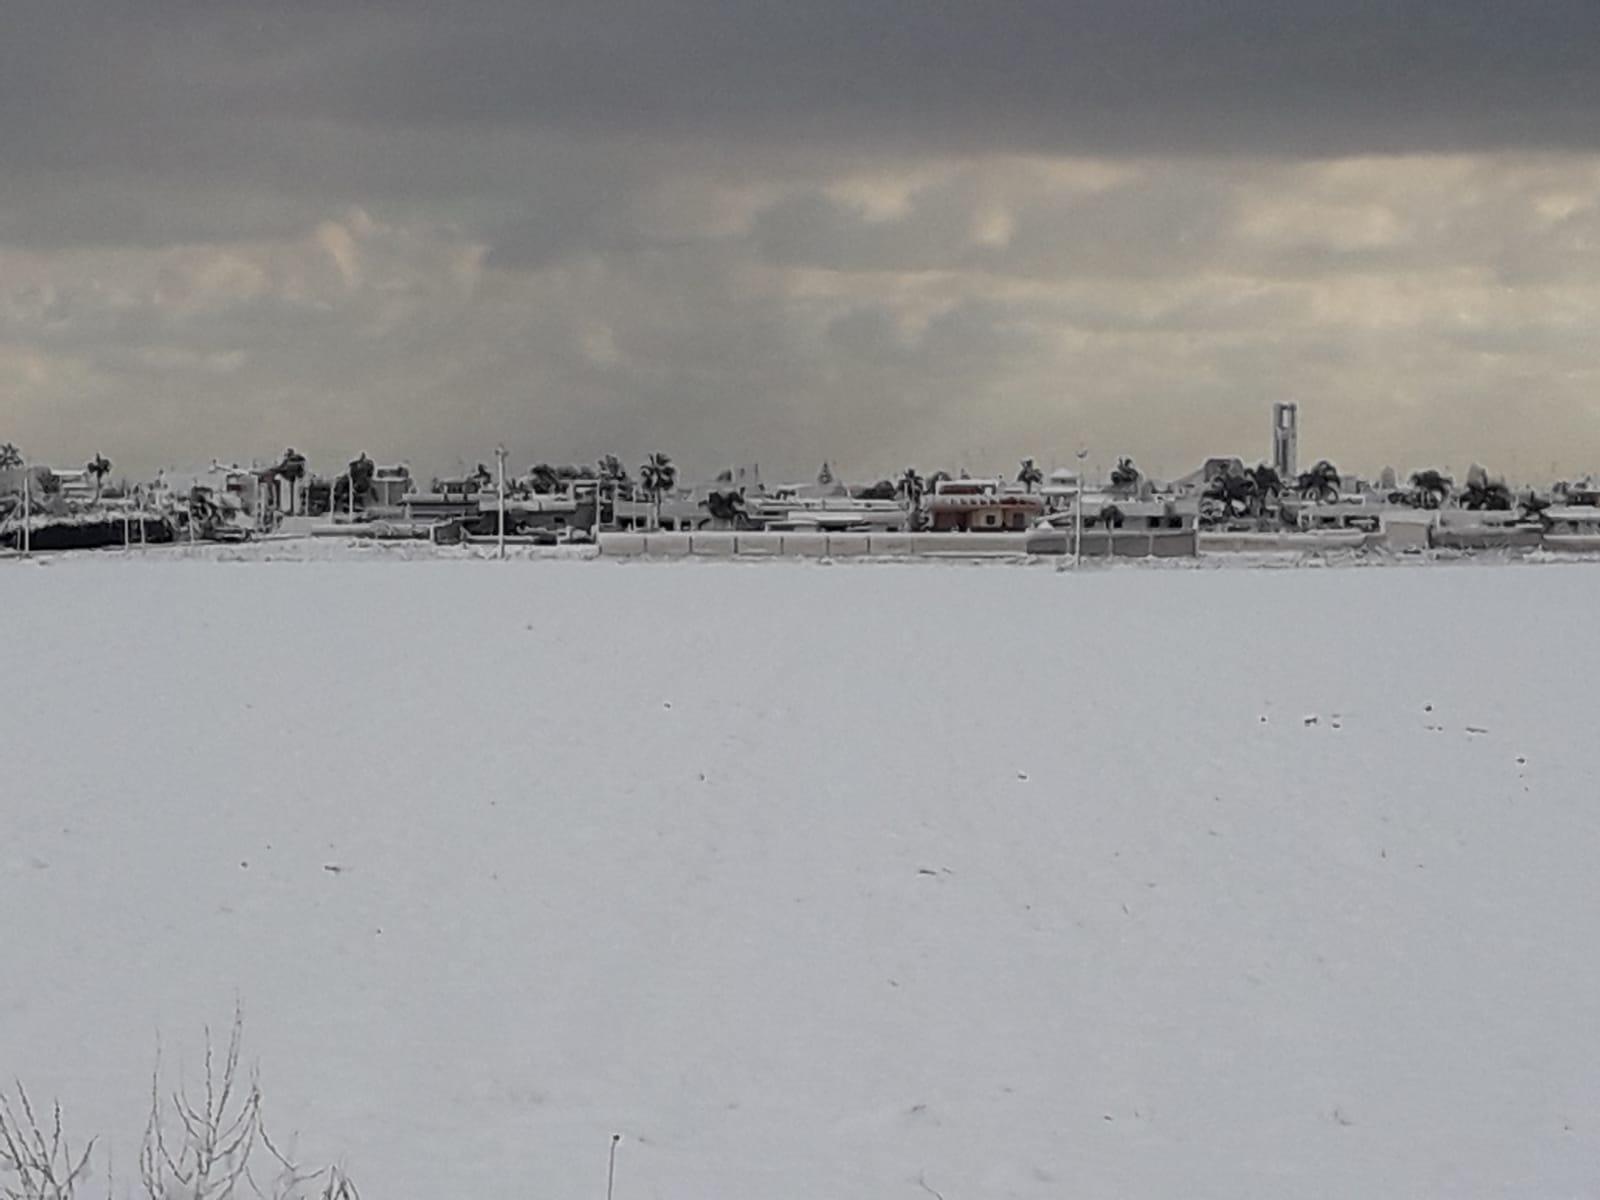 Galleria fotografica neve 03-04 gennaio 2019-img-20190105-wa0003.jpg